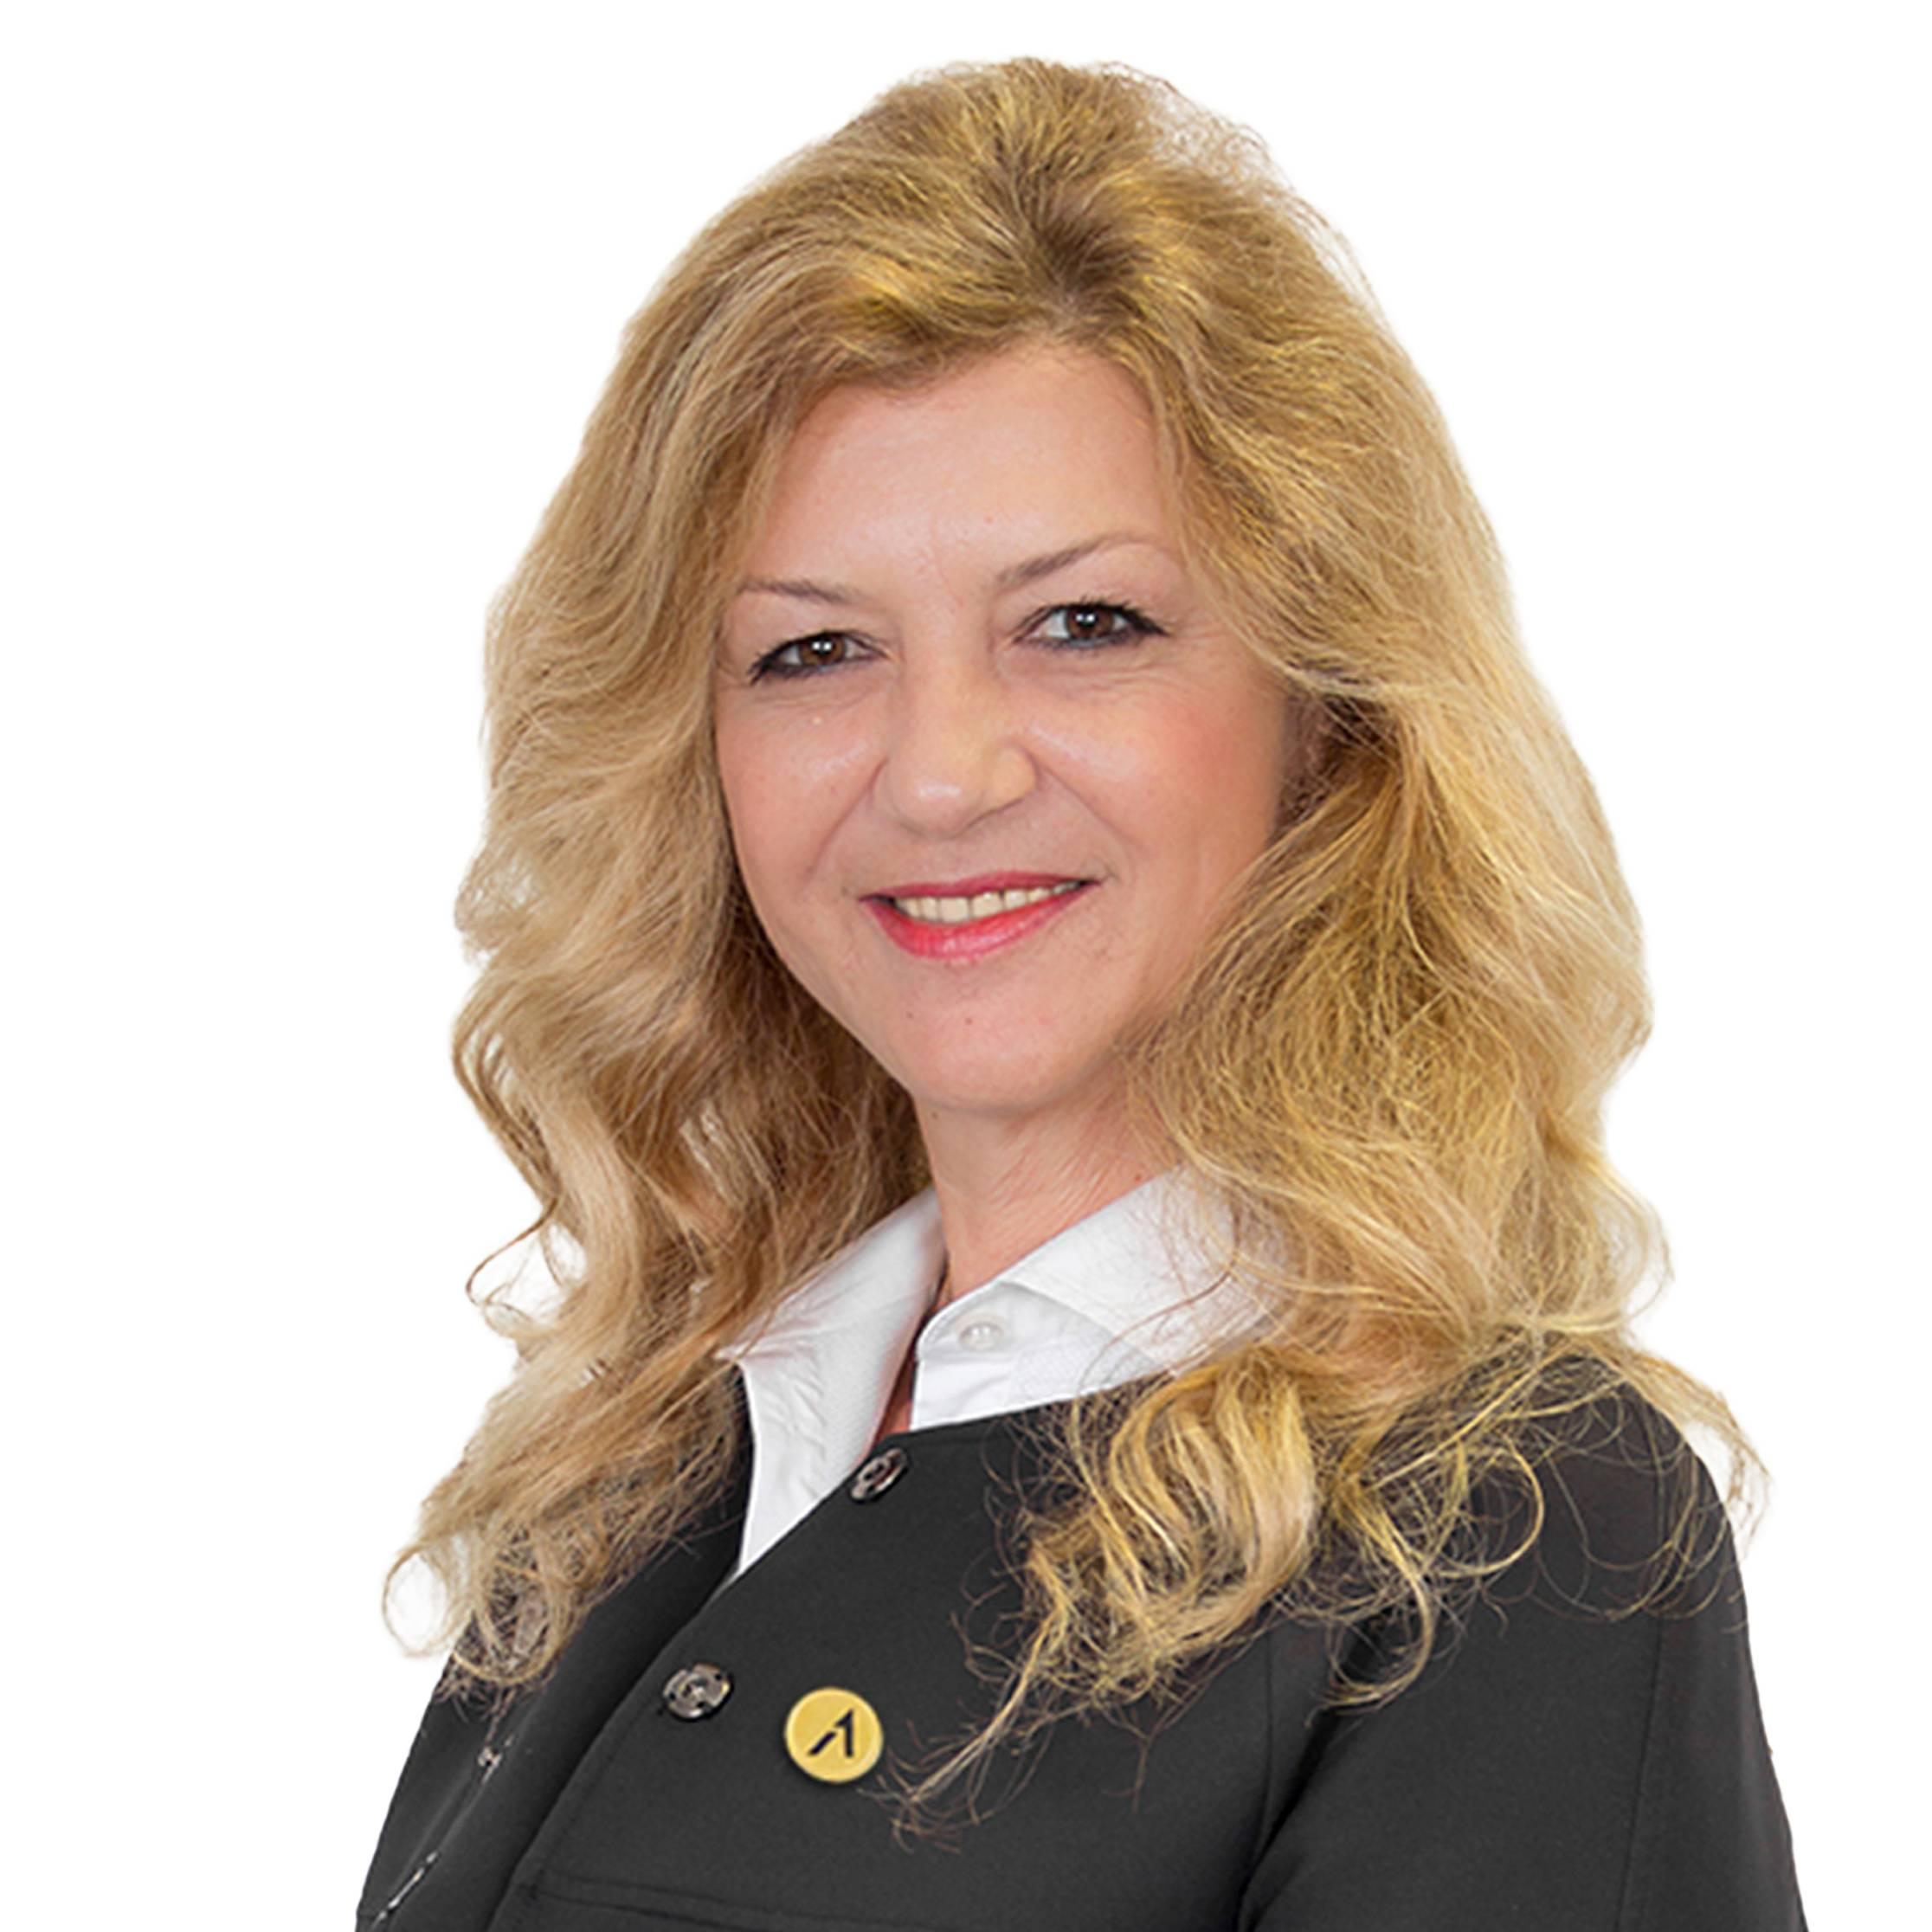 Tina Tzoneva